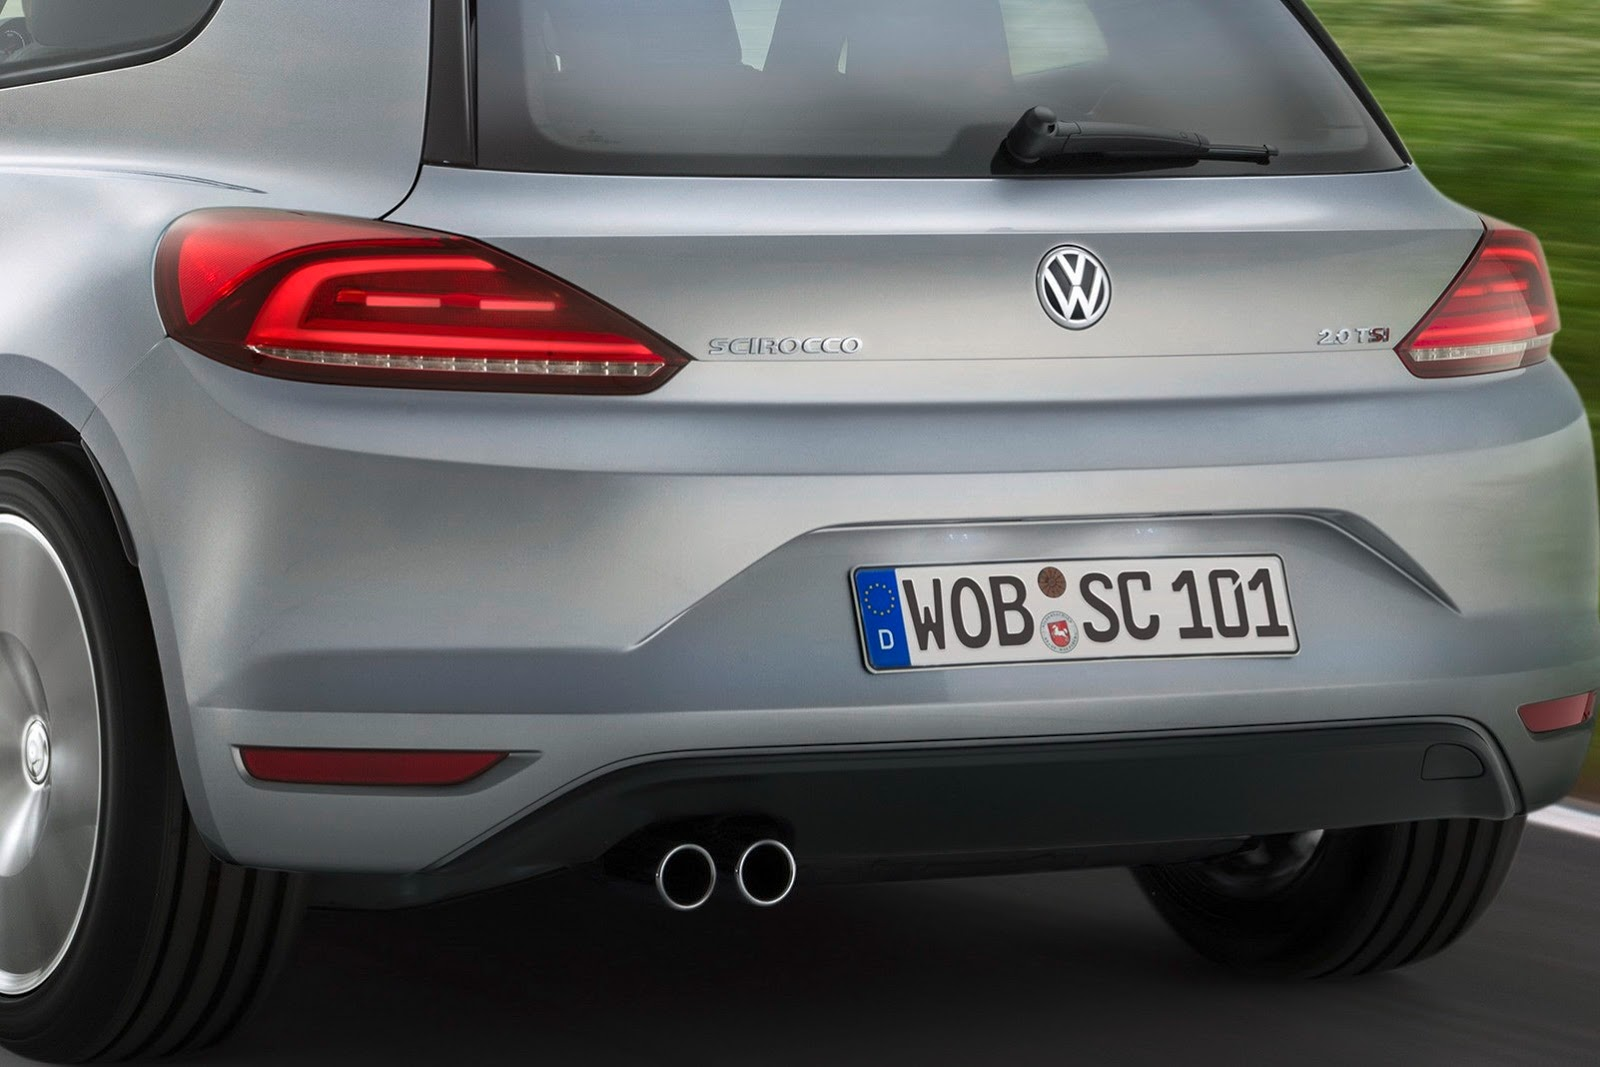 2014 Volkswagen Scirocco Facelift Revealed, Drops 1.4 TSI for 2.0 TSI - autoevolution